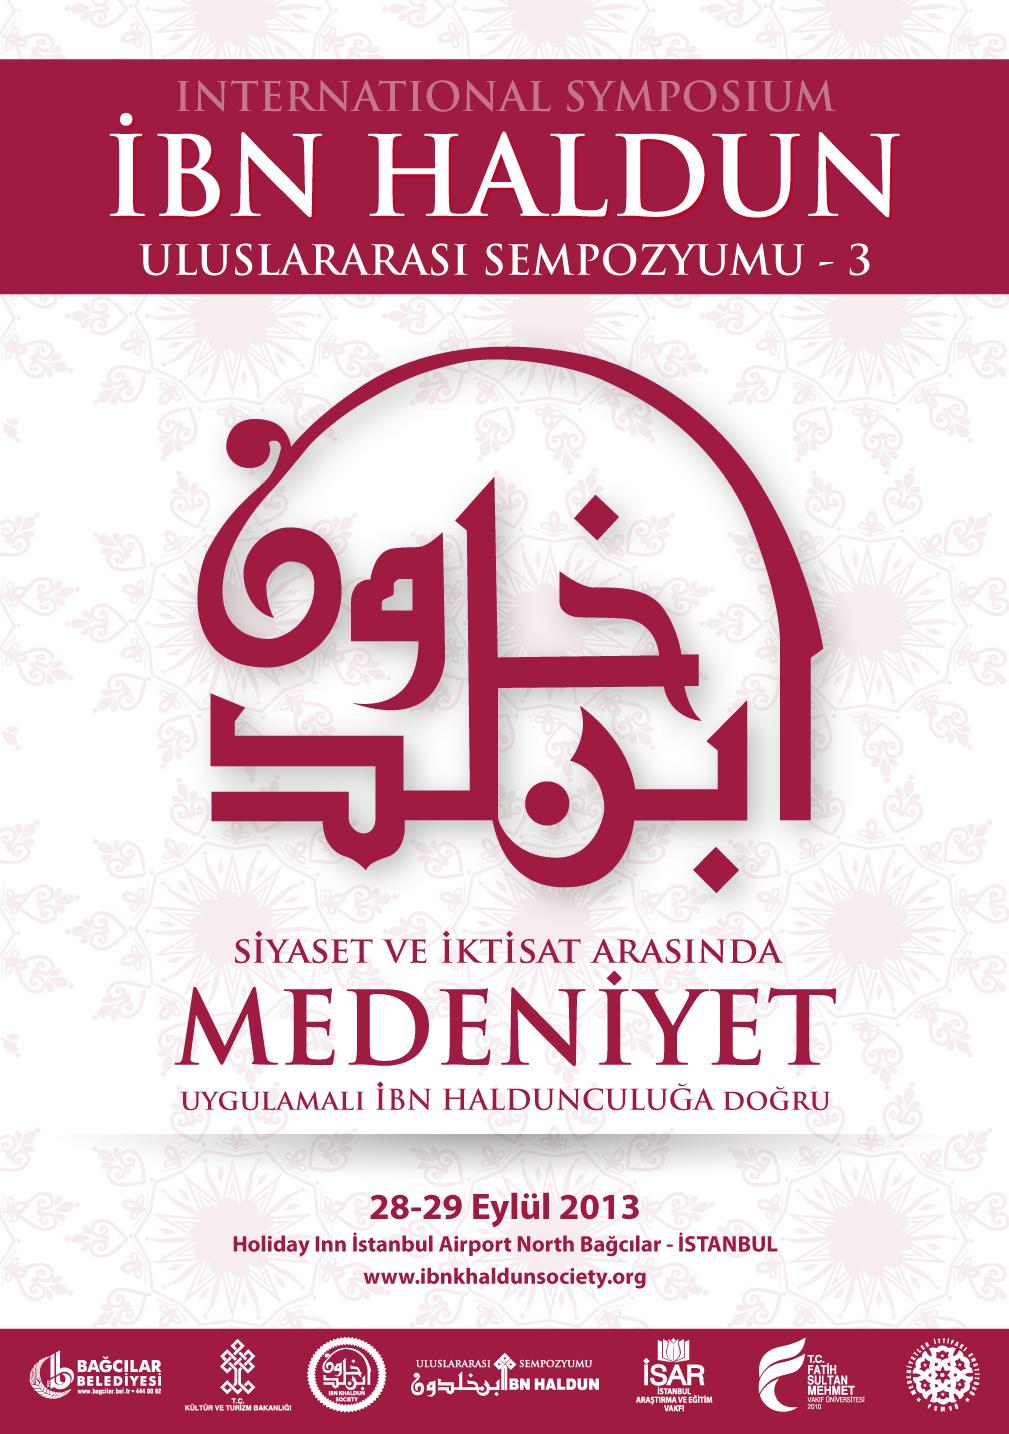 http://medit.fsm.edu.tr/resimler/upload/IBN-Haldun-Uluslararasi-Sempozyumu-3-1110913.jpg